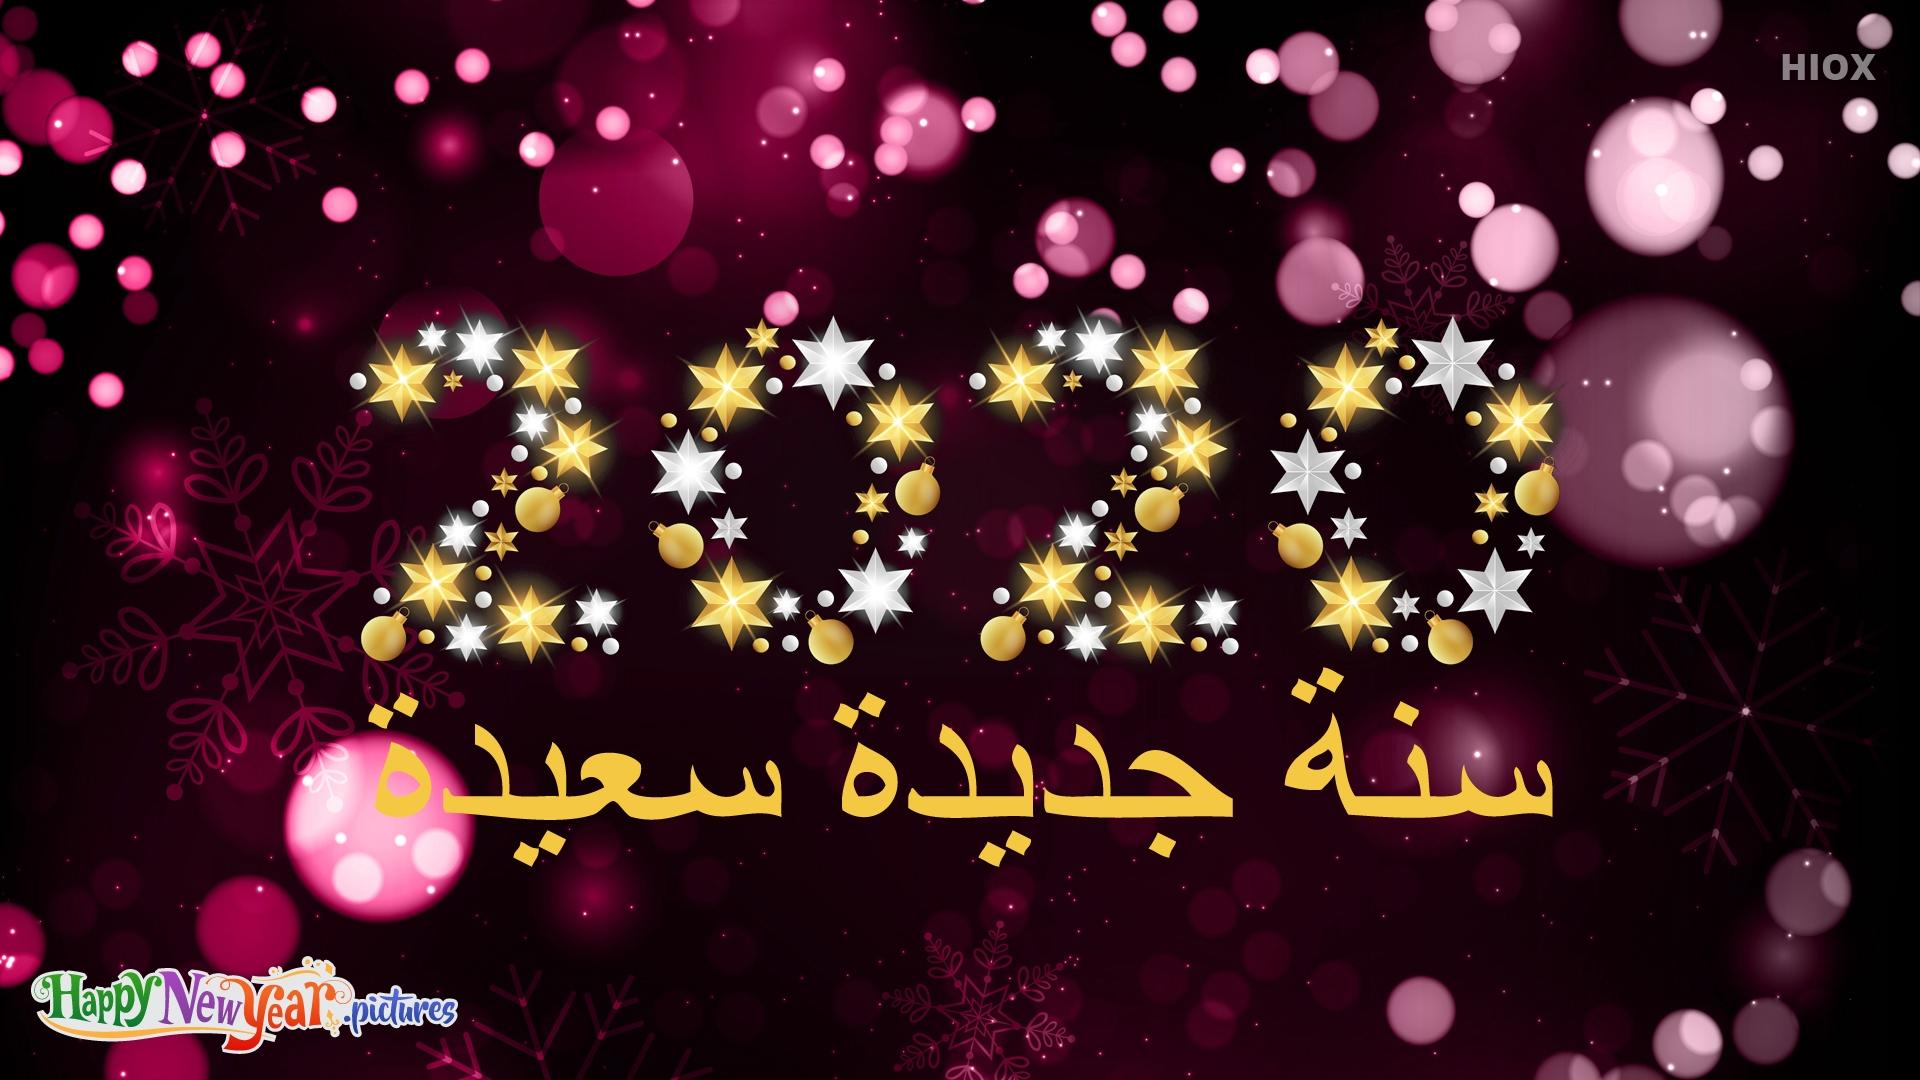 Joyous Happy New Year 2020 Wishes In Arabic